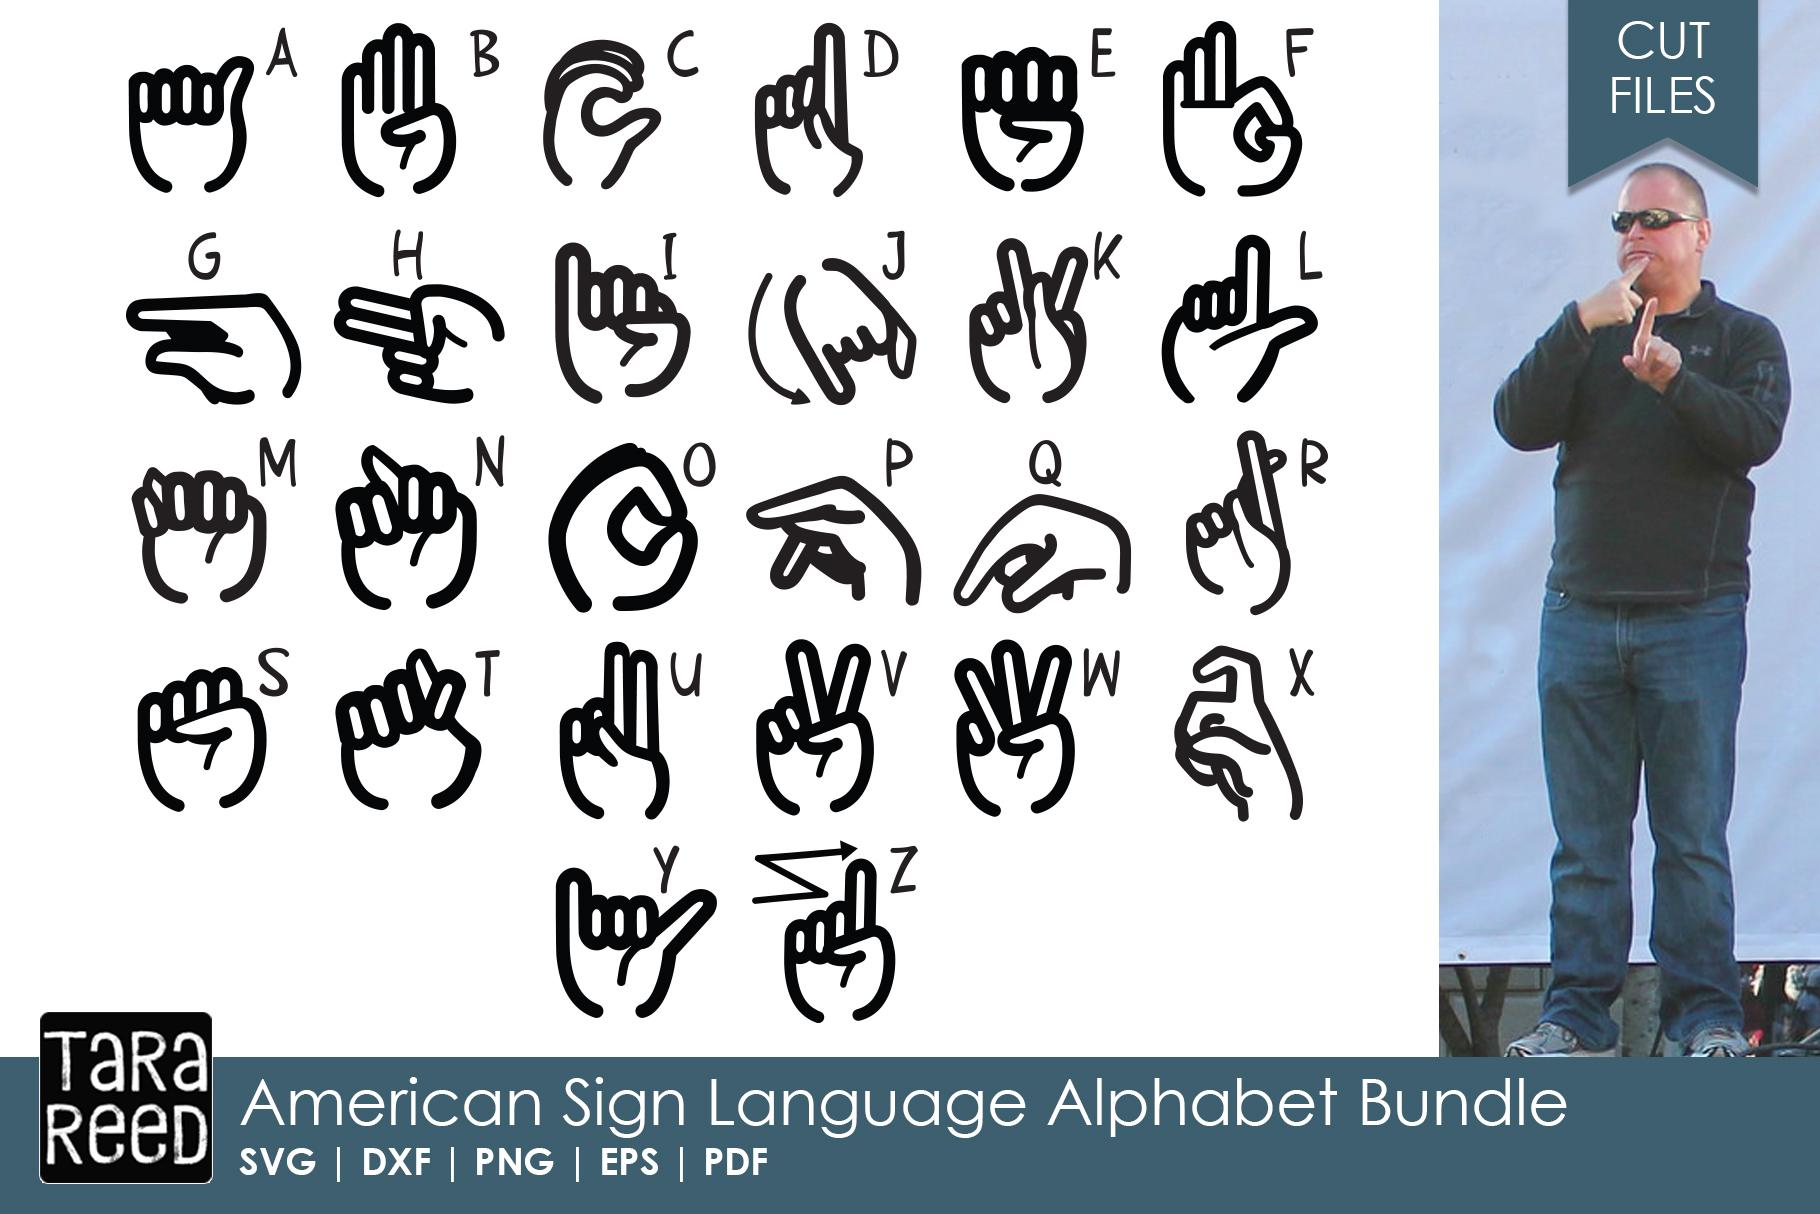 American Sign Language Alphabet Bundle